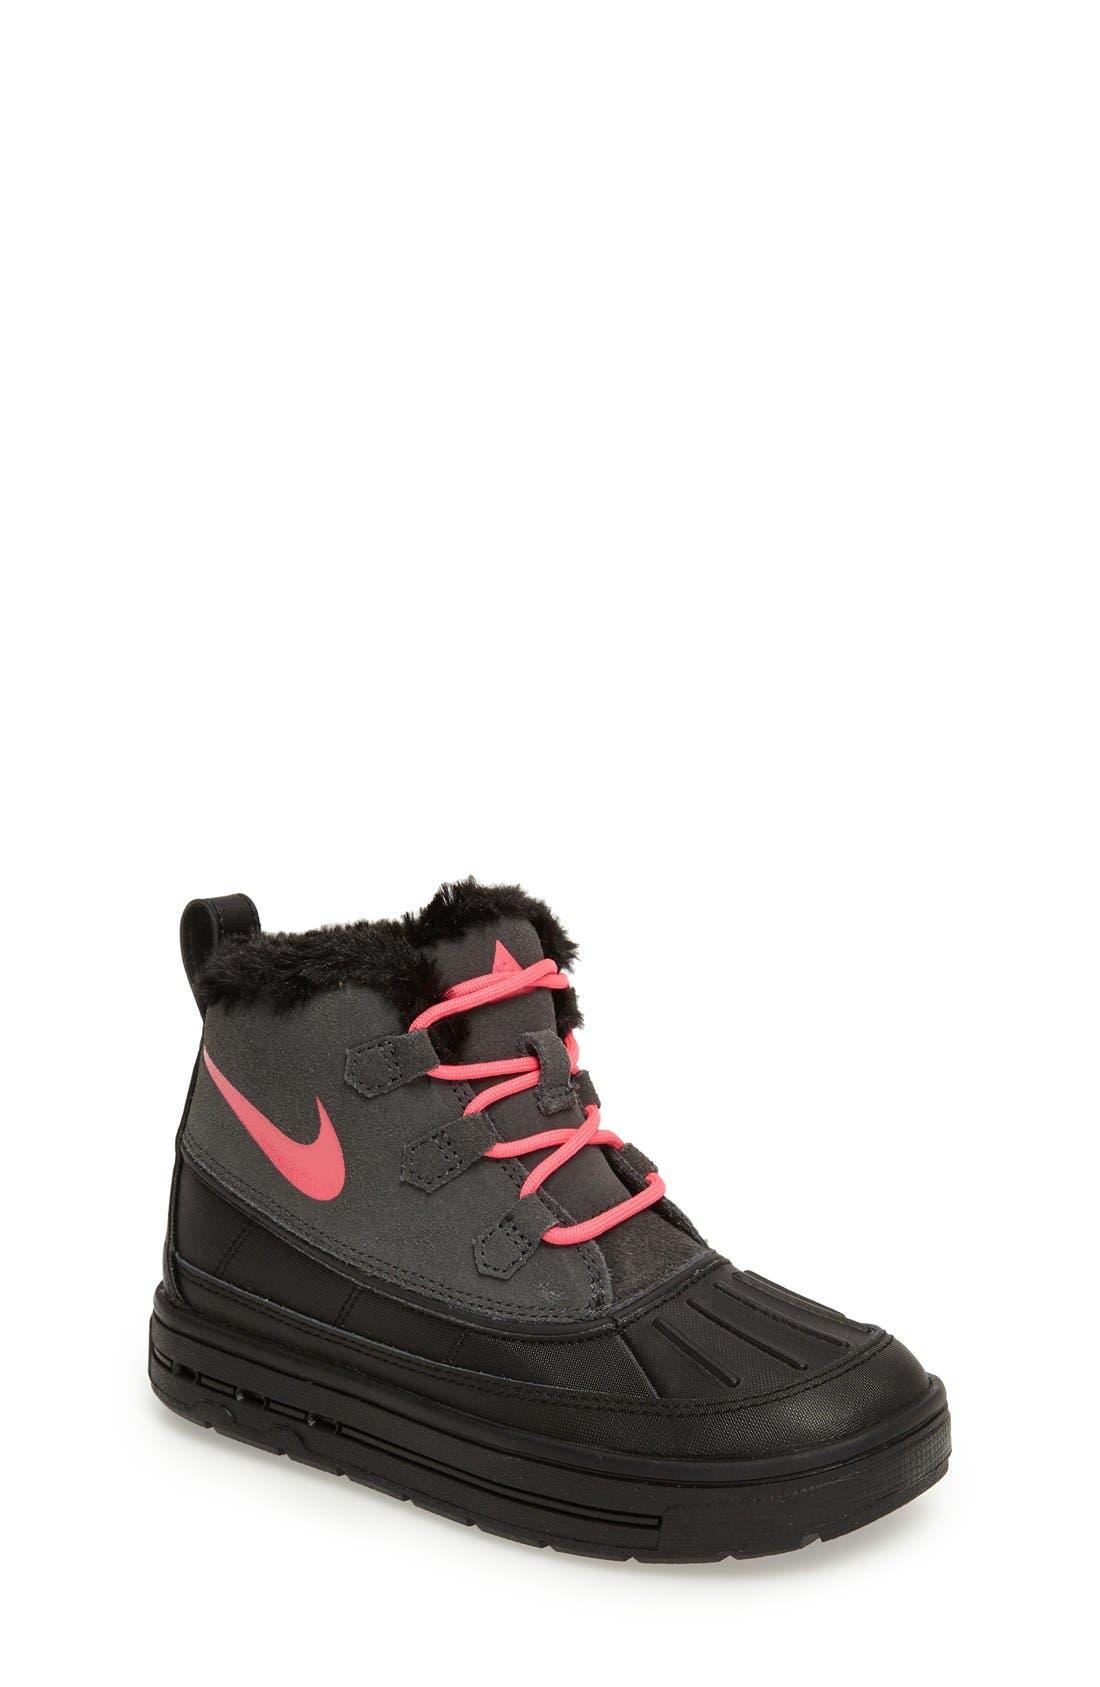 NIKE Woodside Chukka Boot, Main, color, 004